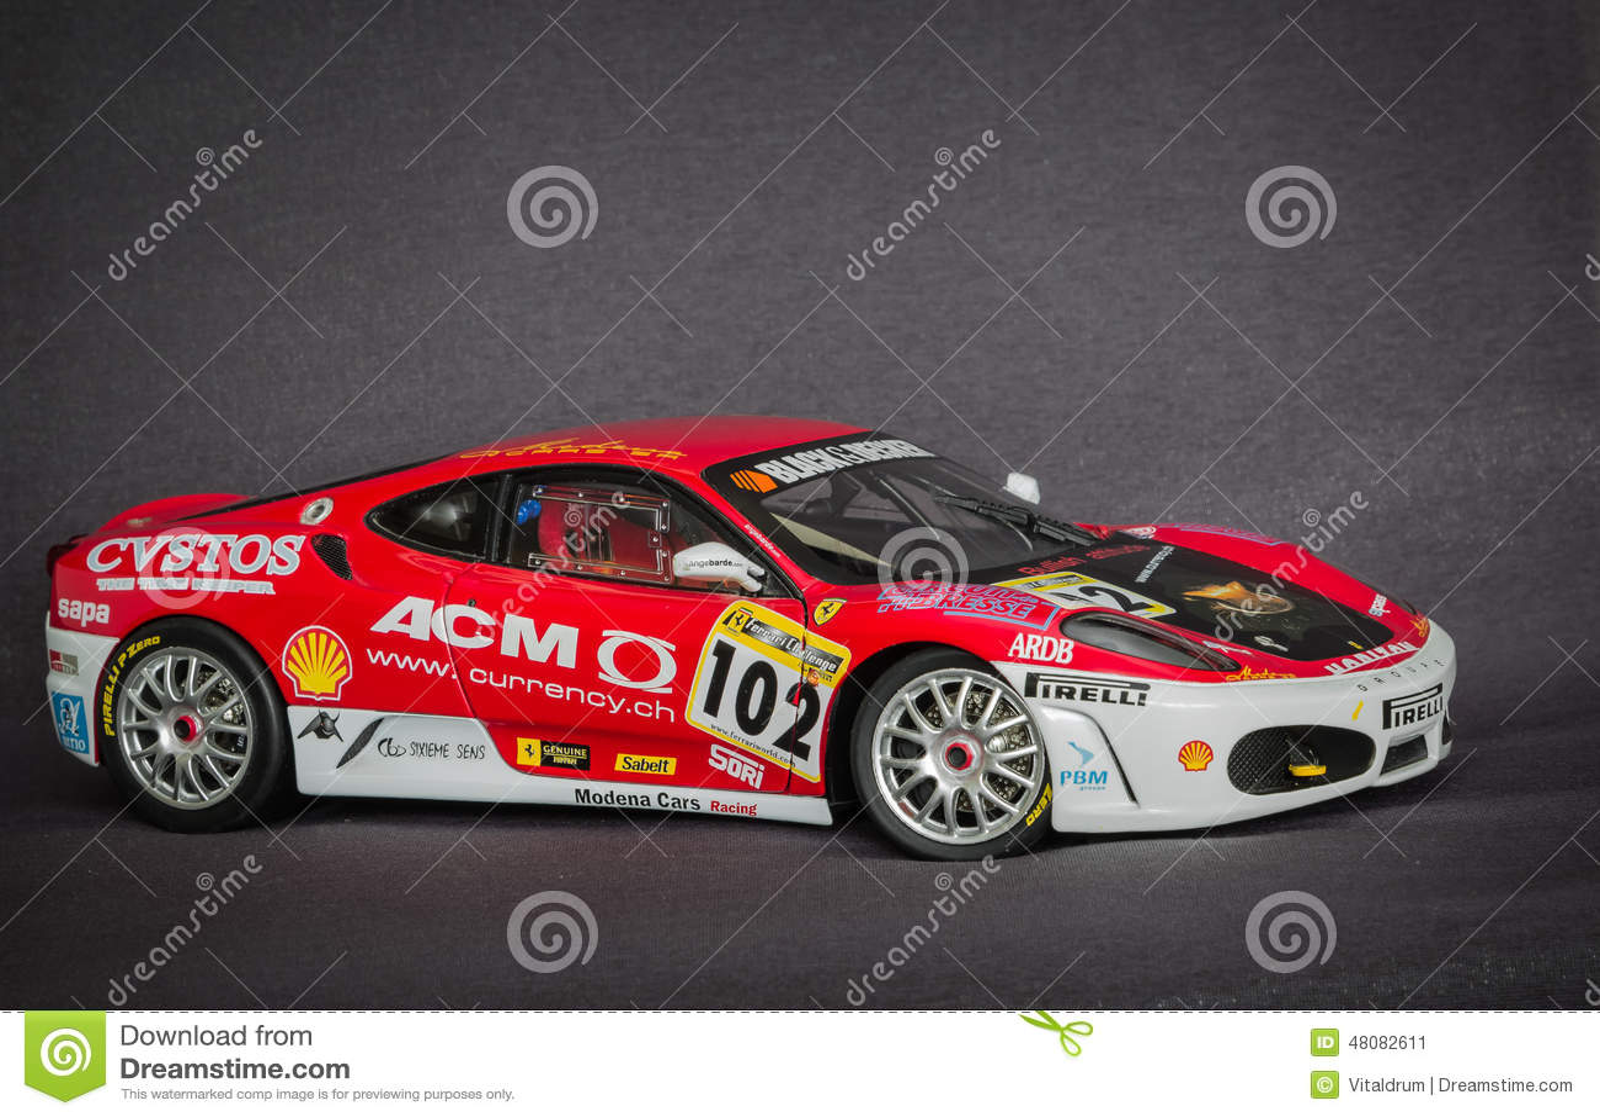 Beautiful Charming View Of Ferrari Race Sport Miniature Car Model